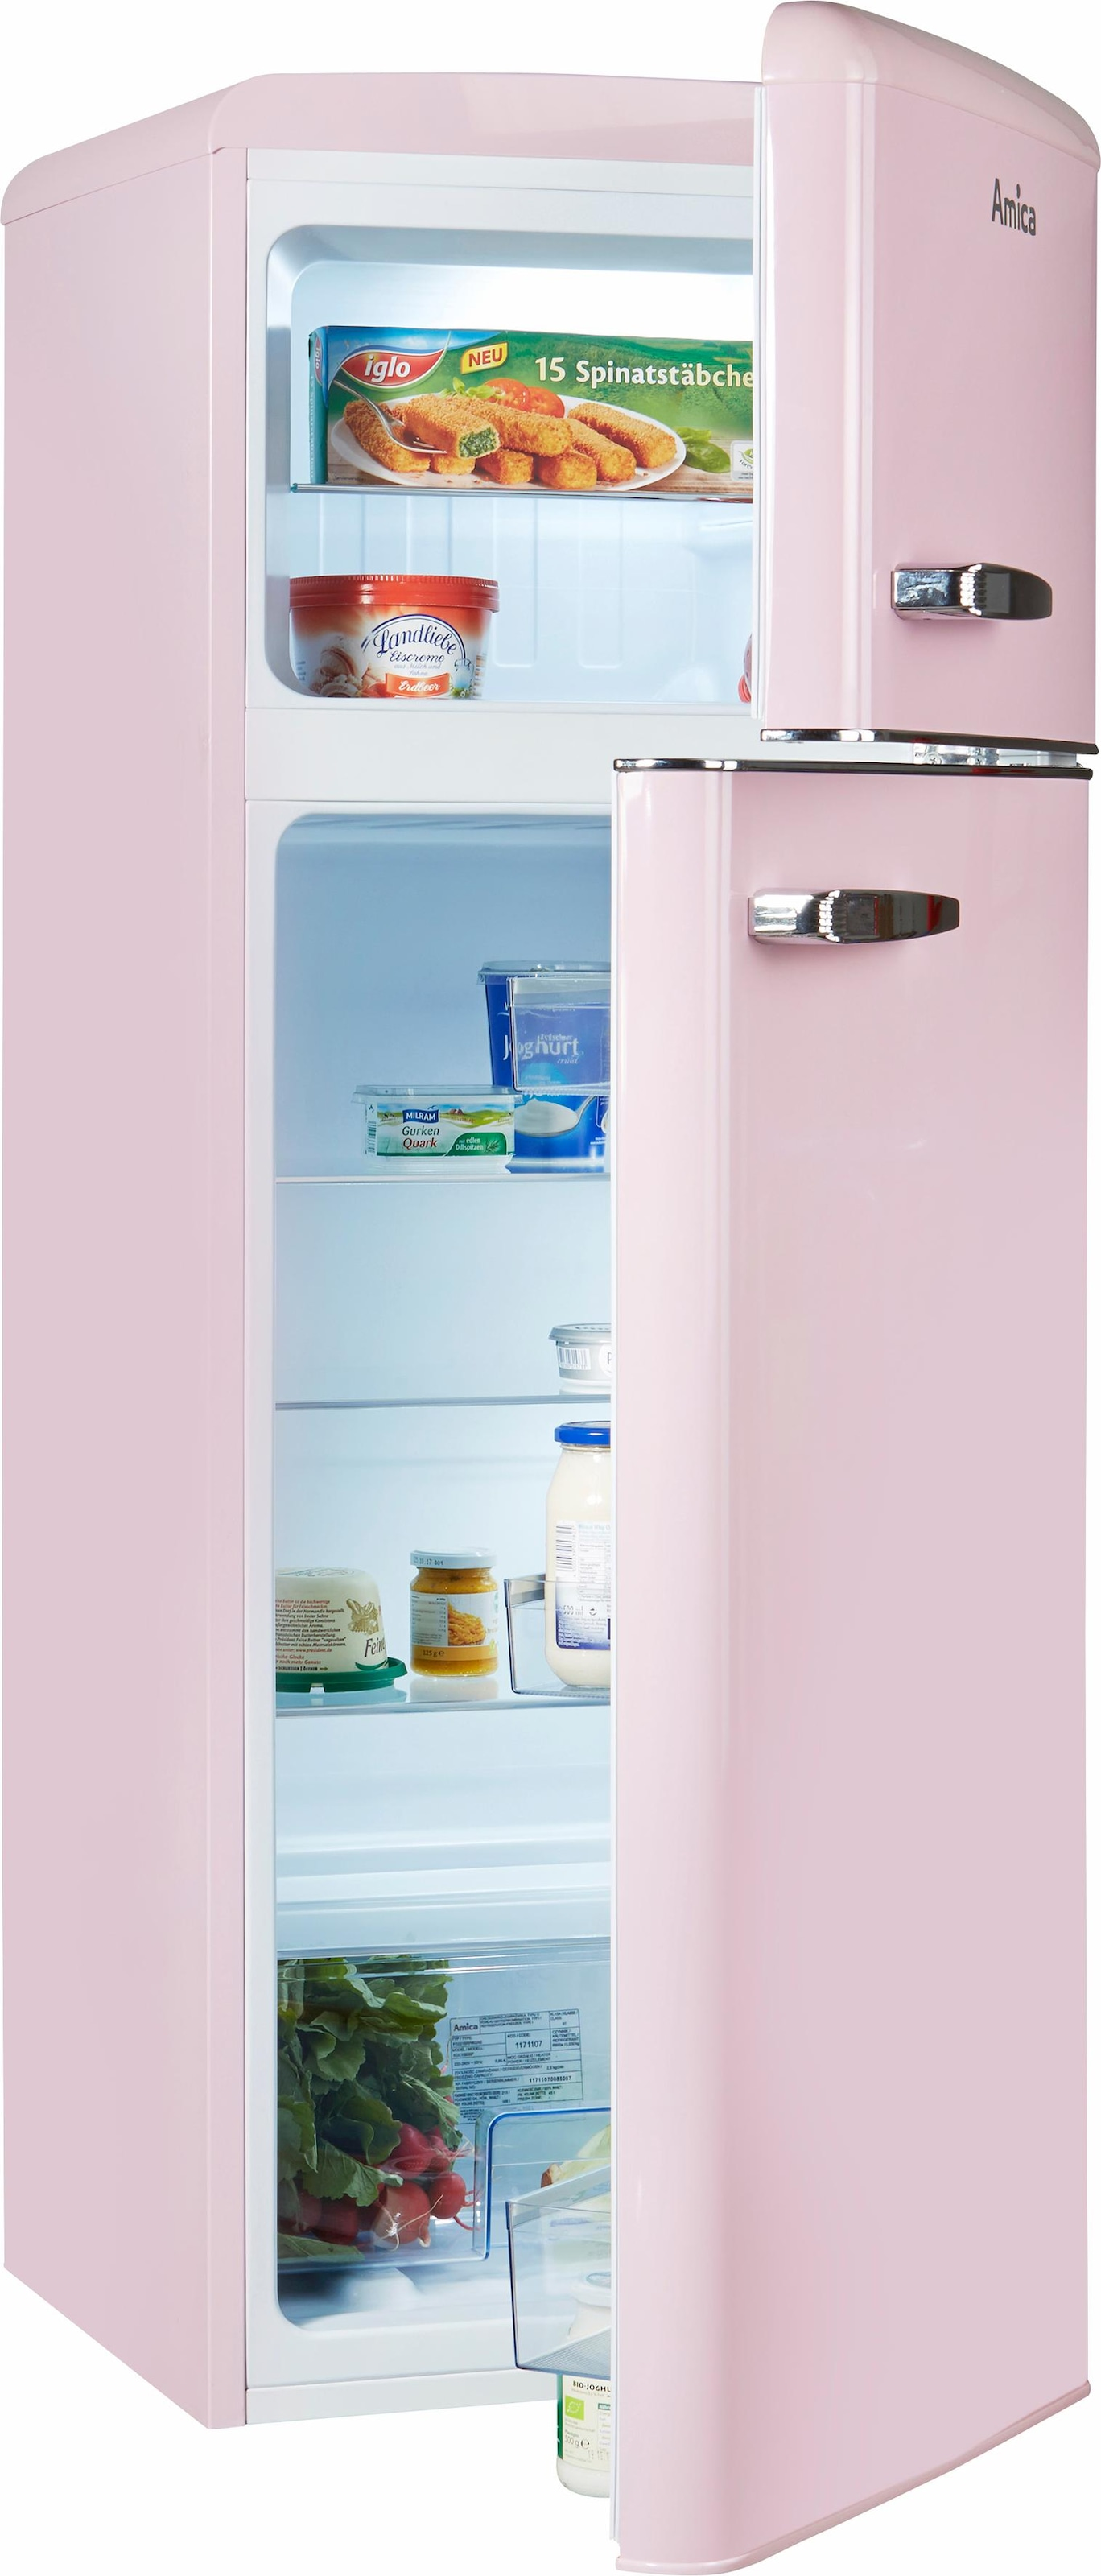 Amica Kühlschrank Retro Türkis : Amica retro kühlschrank rot kühlschrank modelle